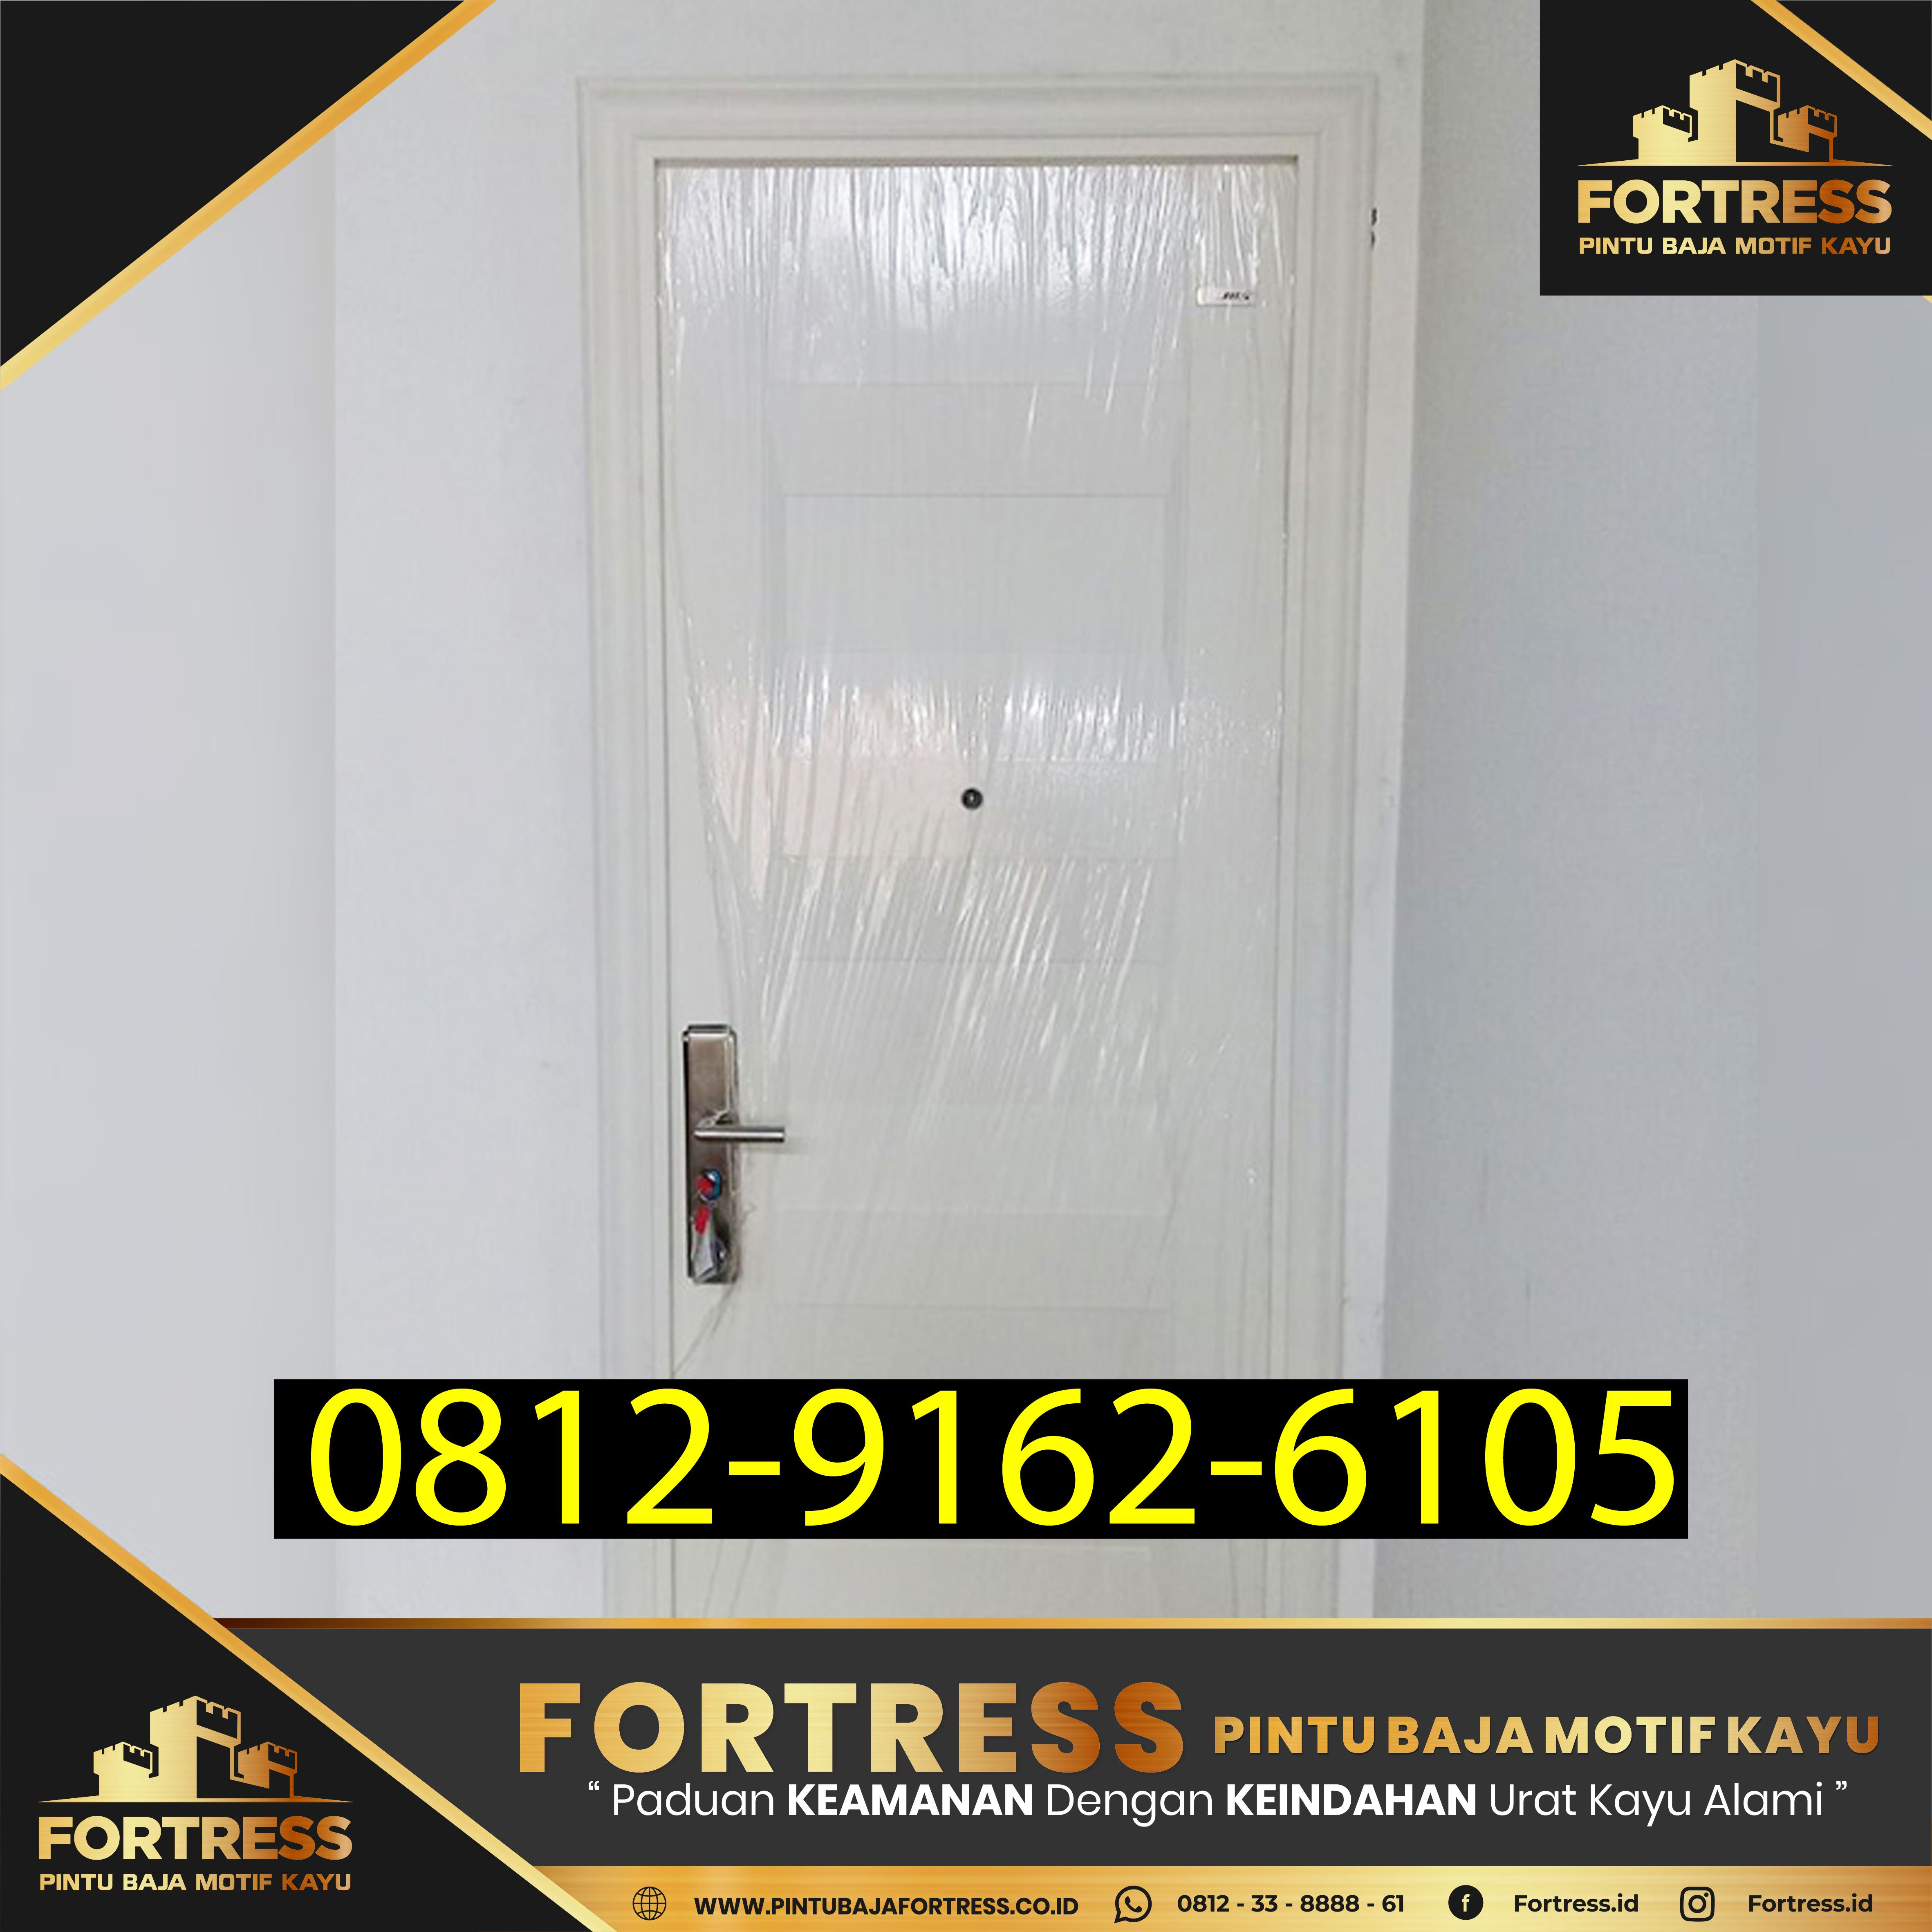 0812-9162-6109 (FORTRESS), Tual Minimalist Door Panels